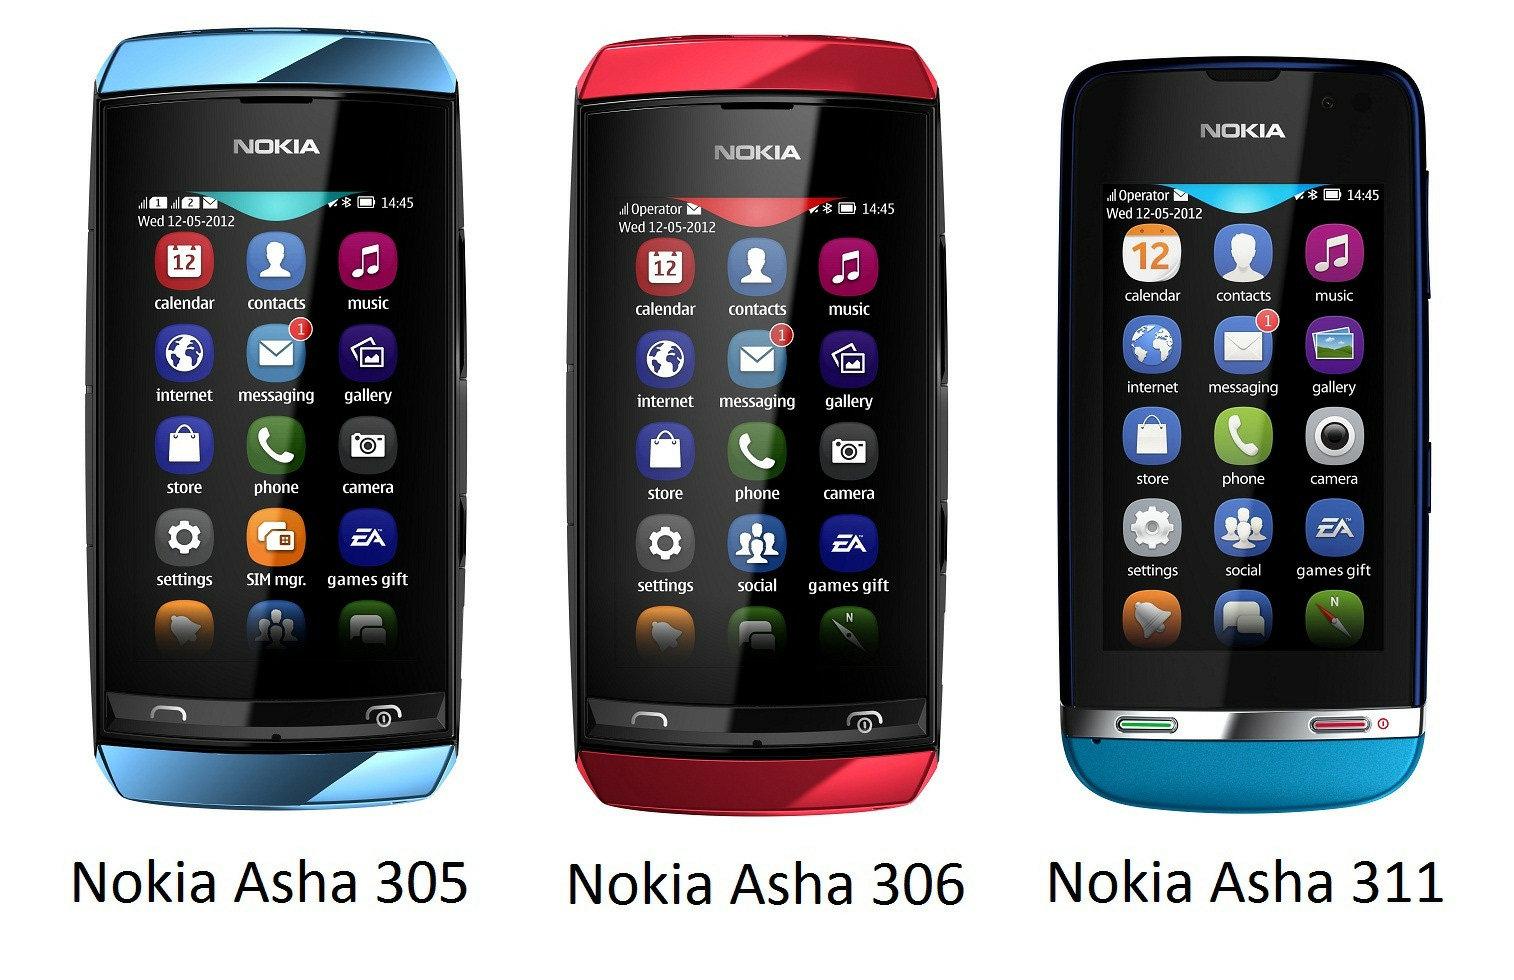 Harga Nokia Asha Terbaru Desember 2012